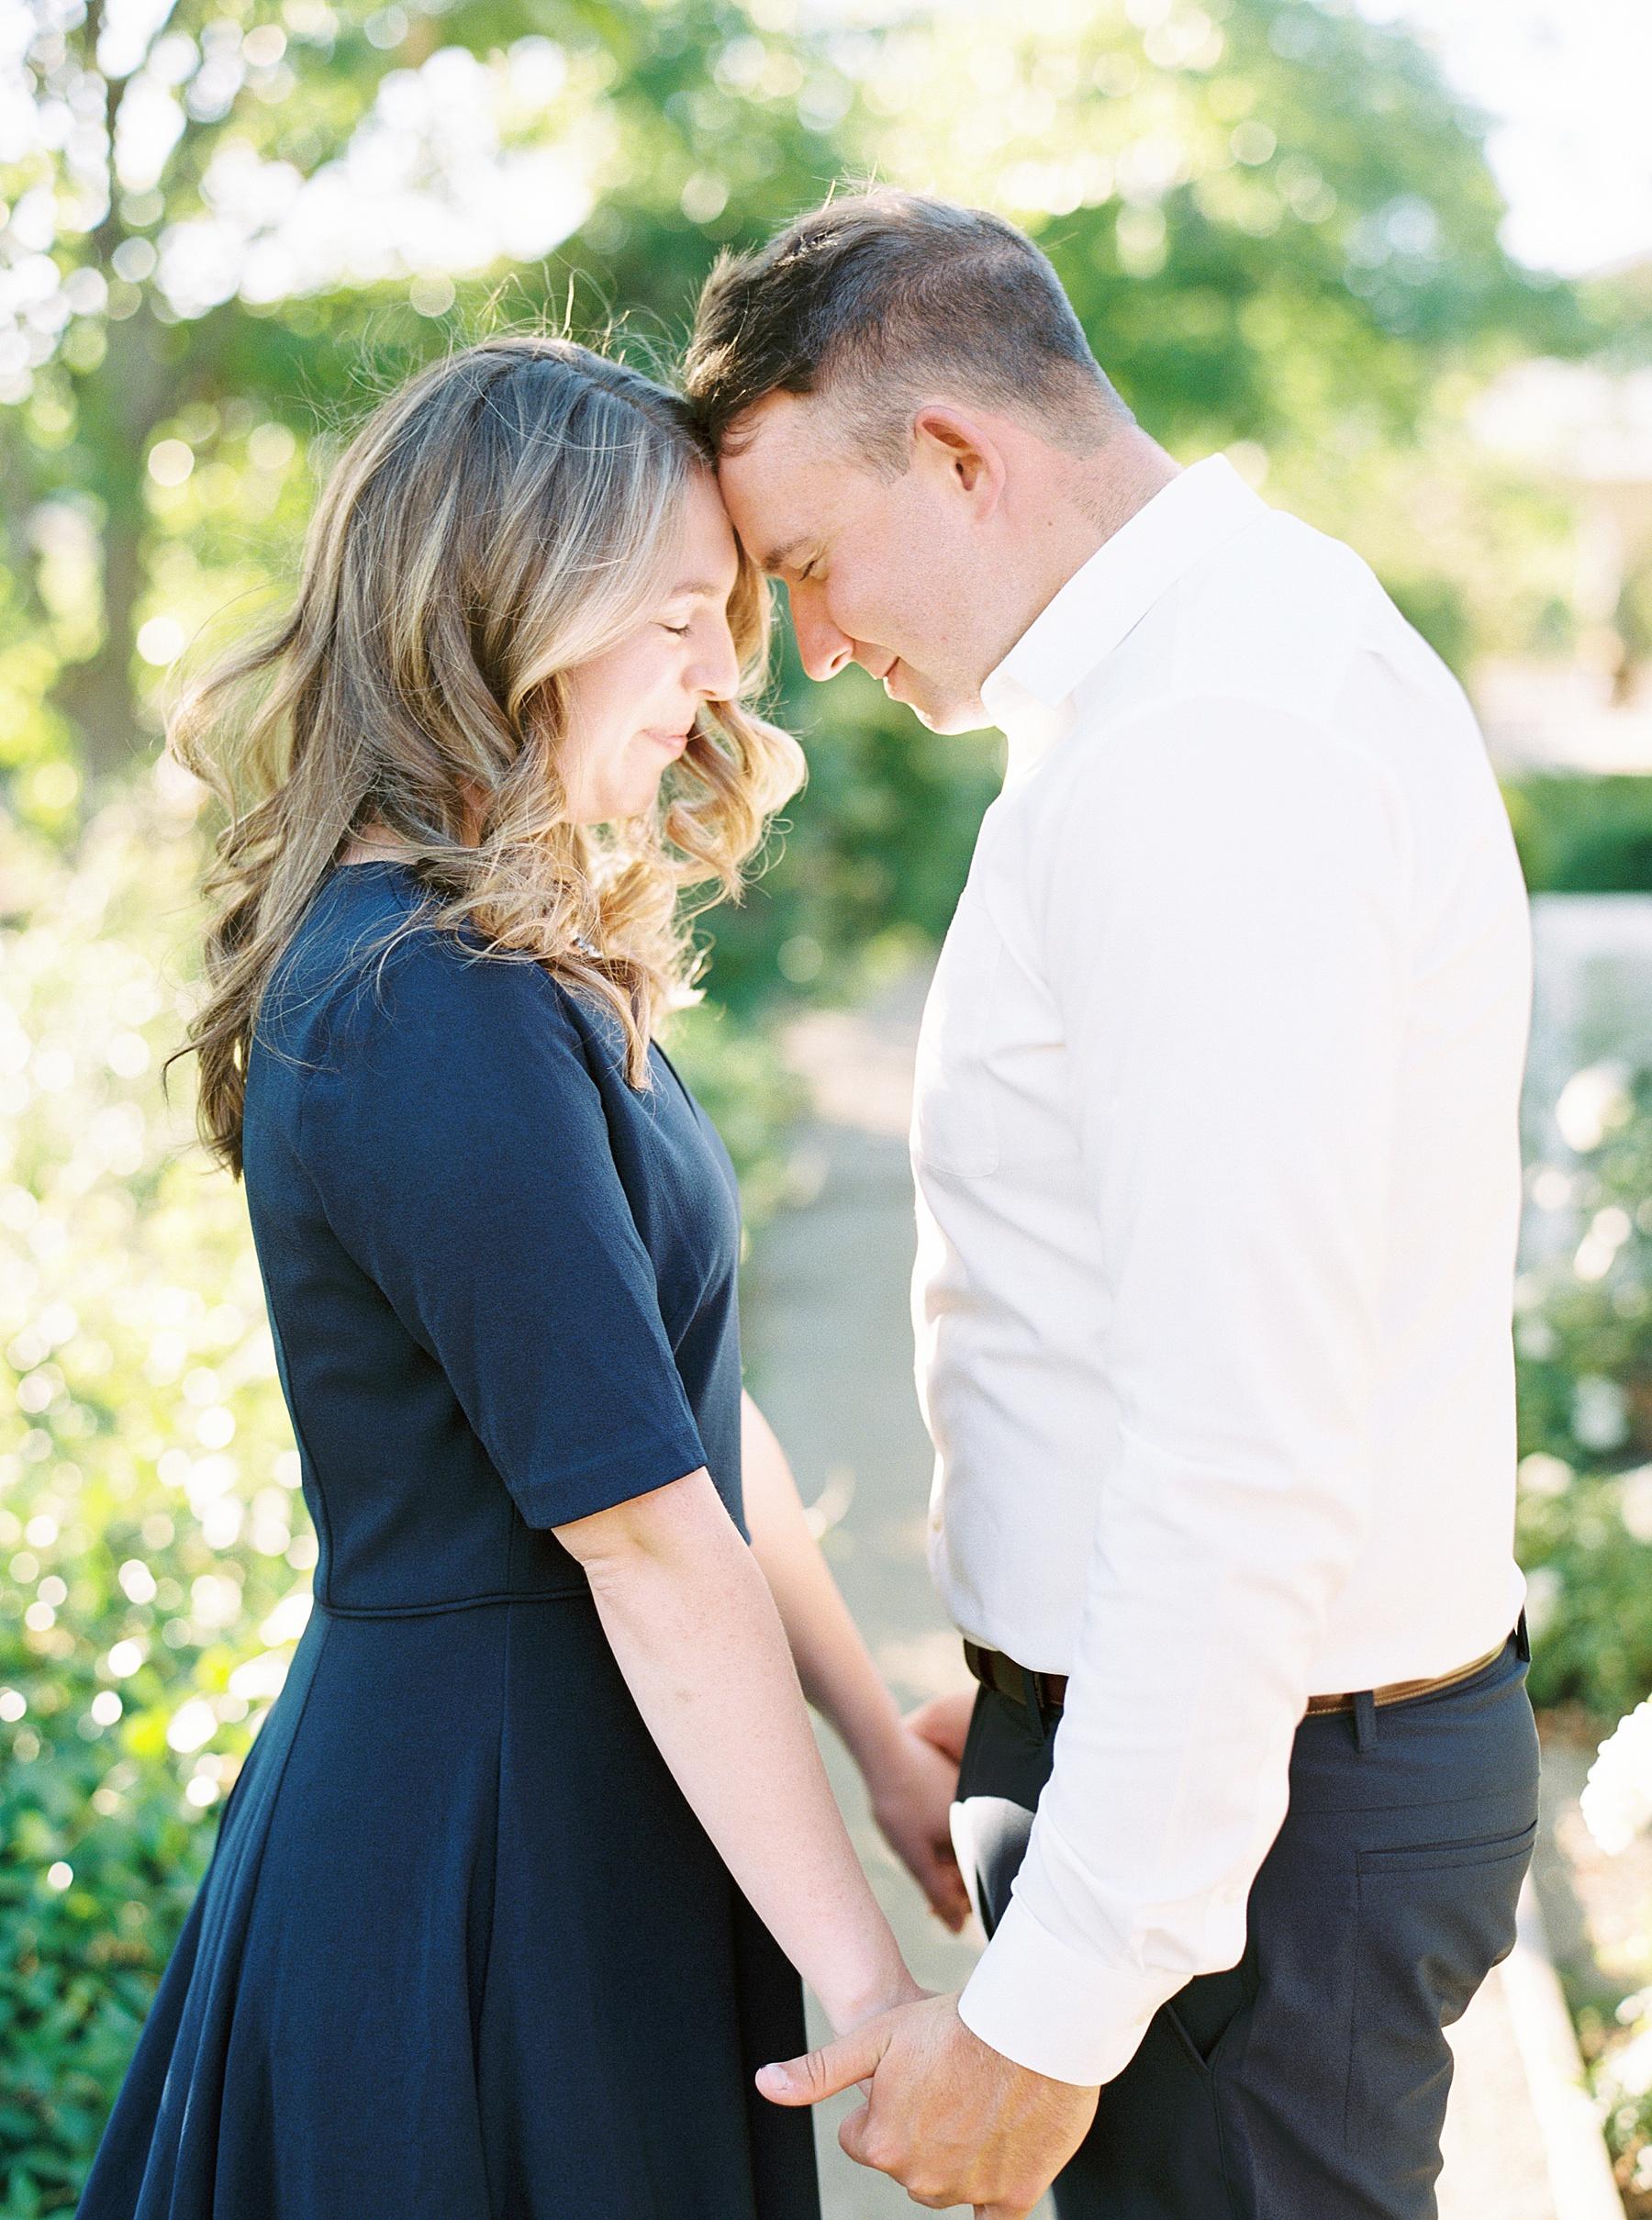 Scribner Bend Winery Engagement Session - Courtney and Steven - Ashley Baumgartner - Sribner Bend Wedding Photographer - Sacramento Wedding Photographer_0011.jpg